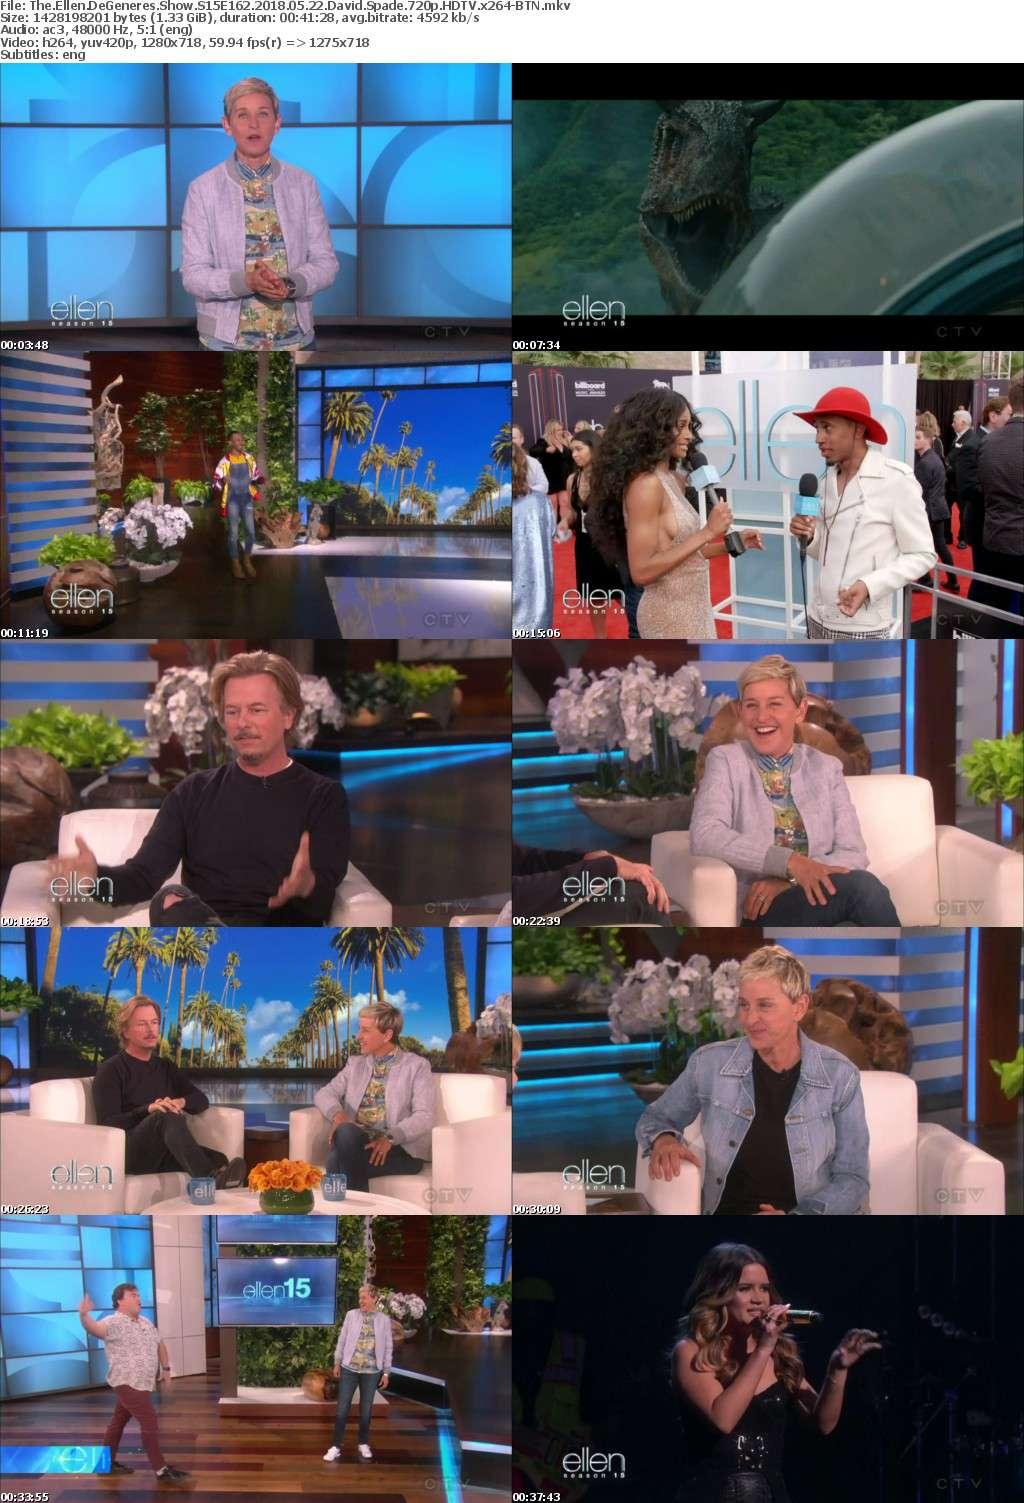 The Ellen DeGeneres Show S15E162 2018 05 22 David Spade 720p HDTV x264-BTN